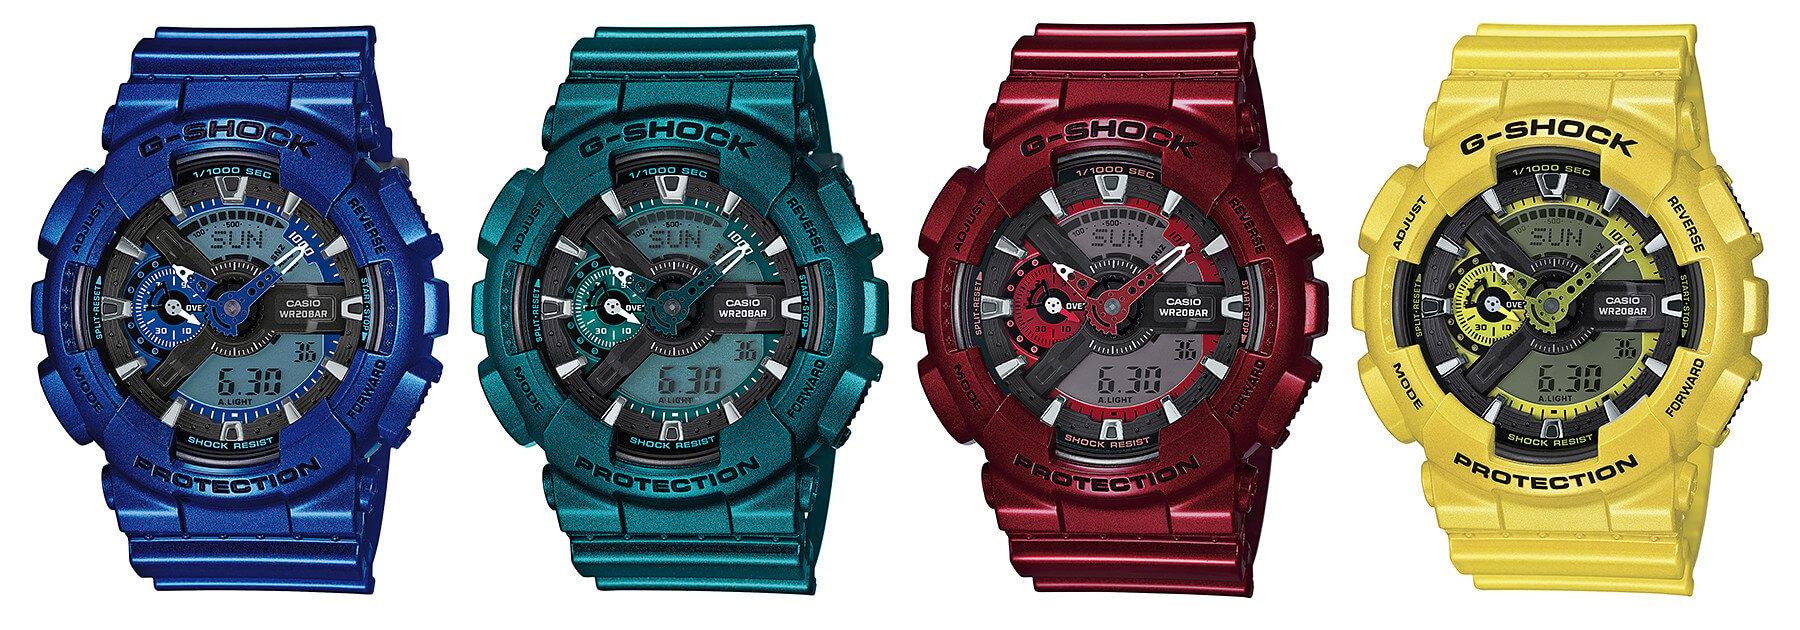 b43bff85c23 G-Shock GA-110NM Neo Metallic Series – G-Central G-Shock Watch Fan Blog